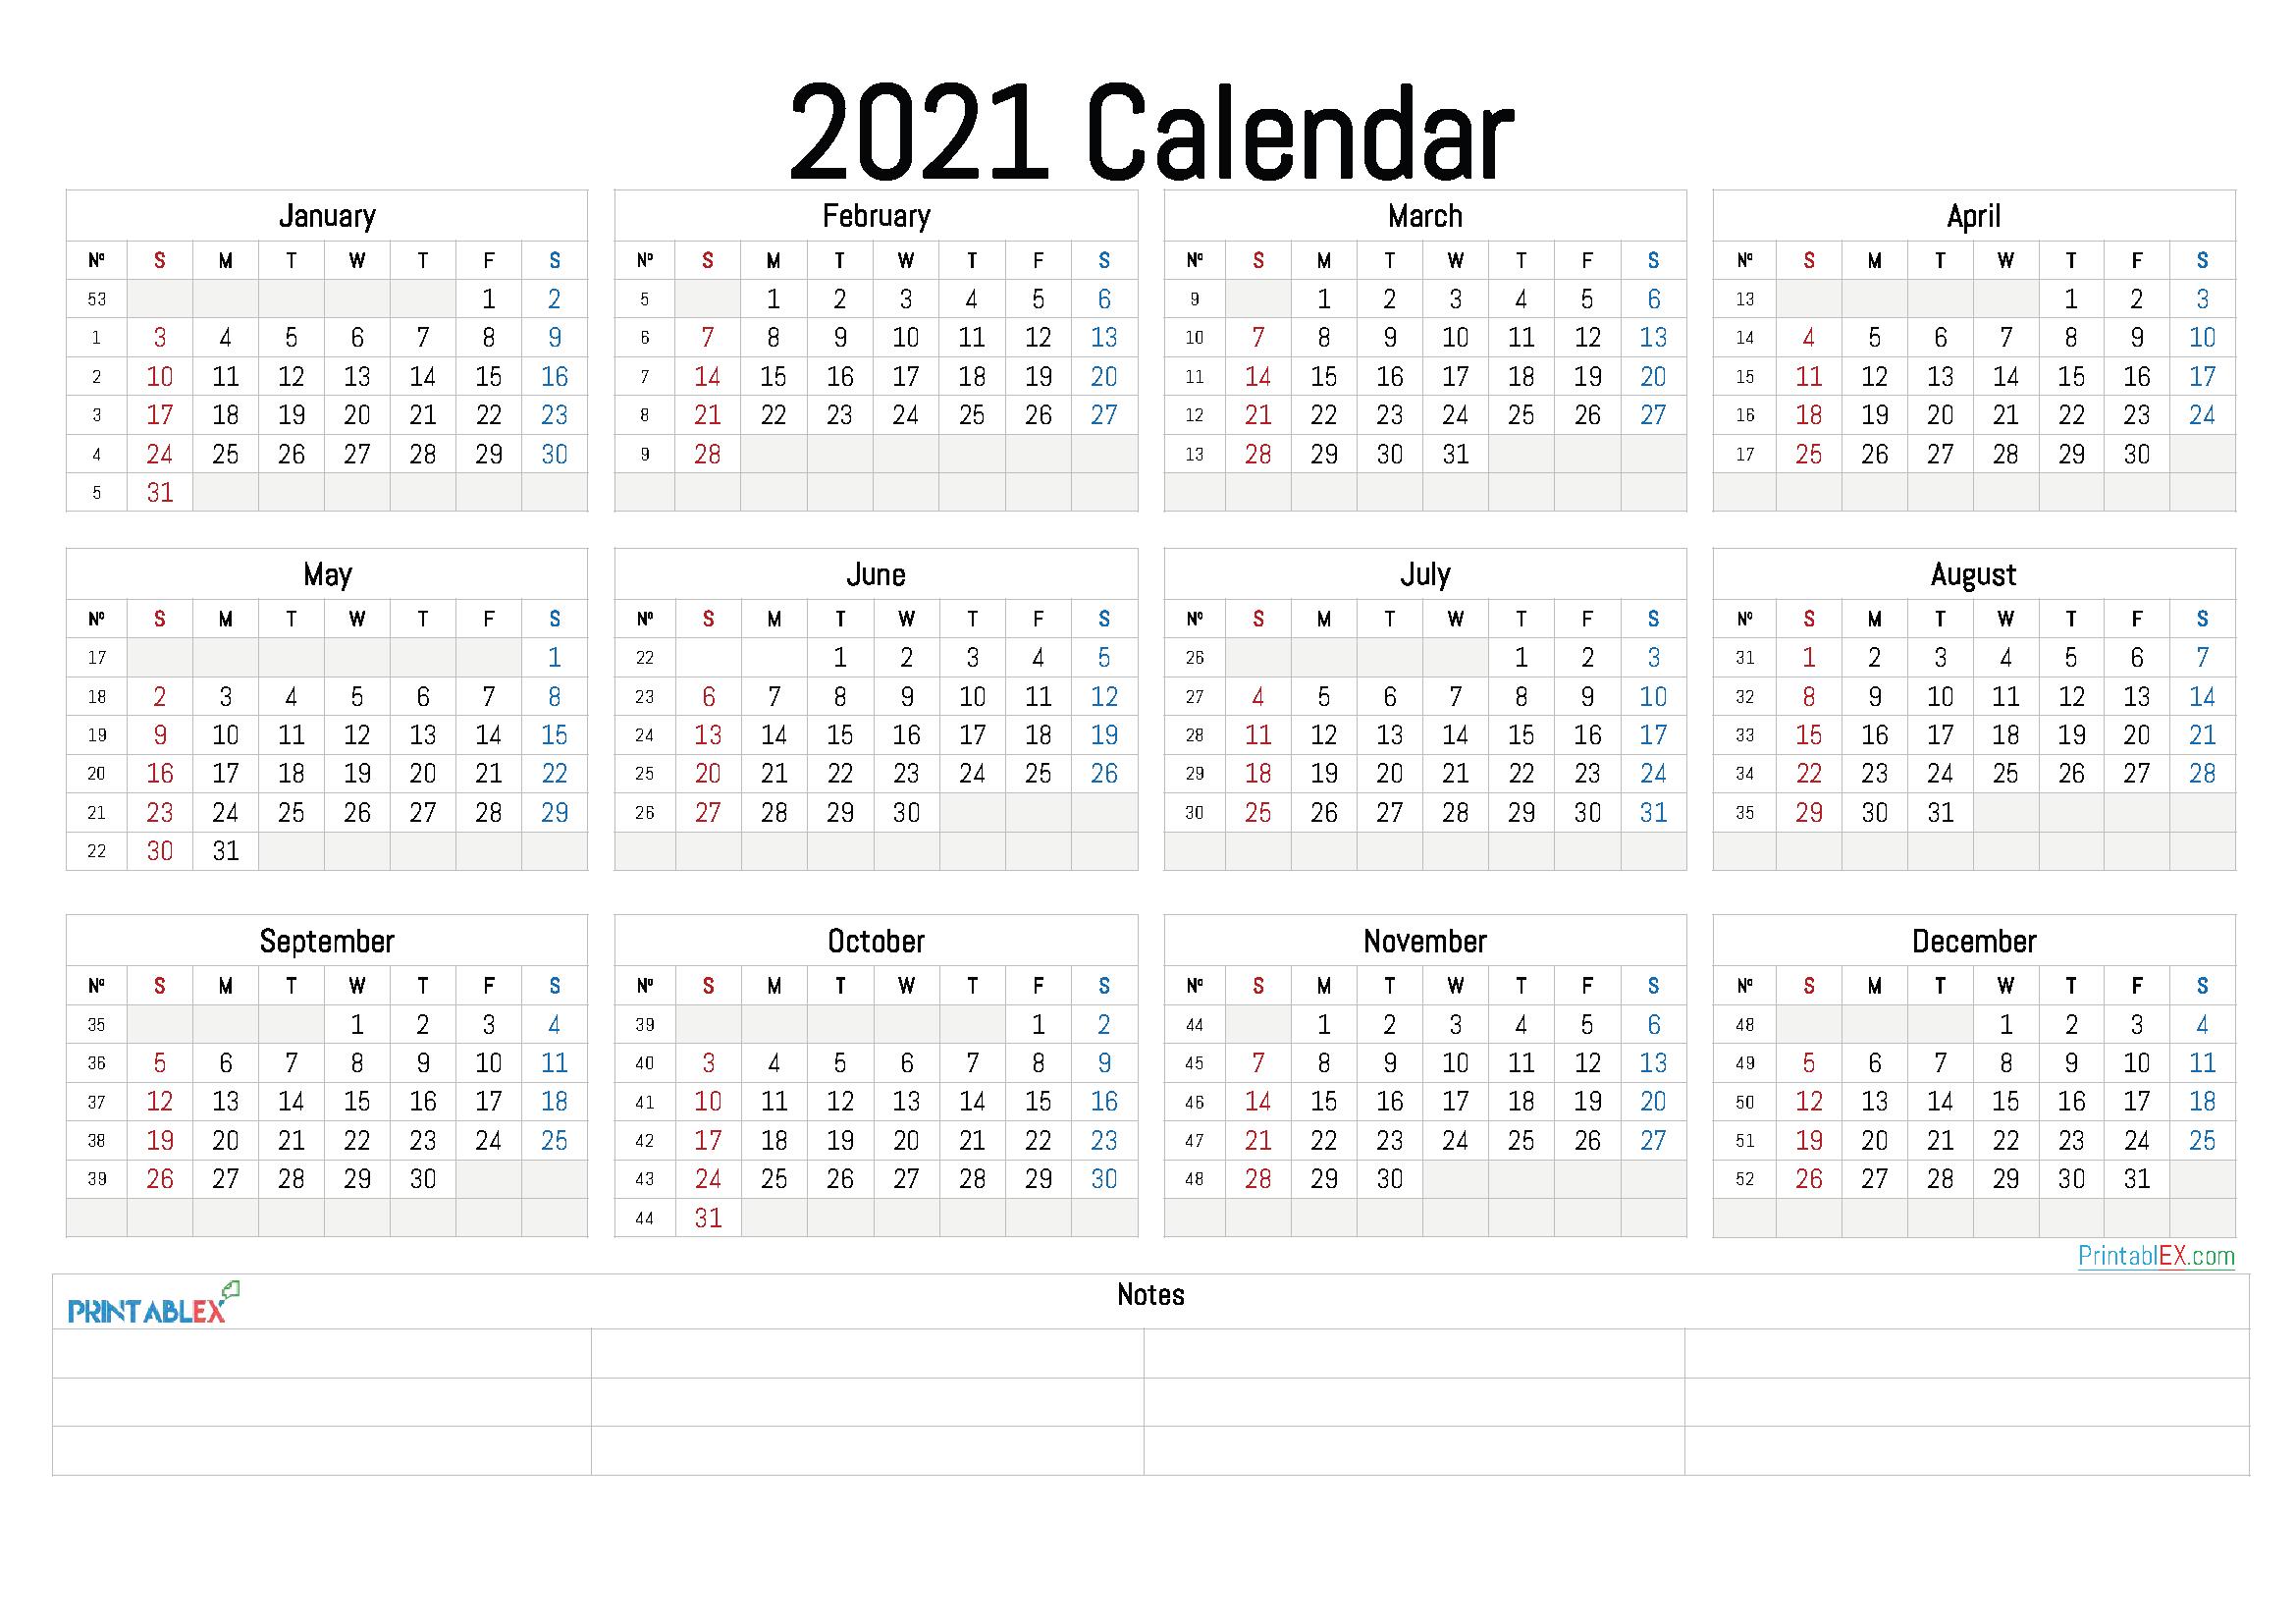 2021 Annual Calendar Printable Free Printable 2020